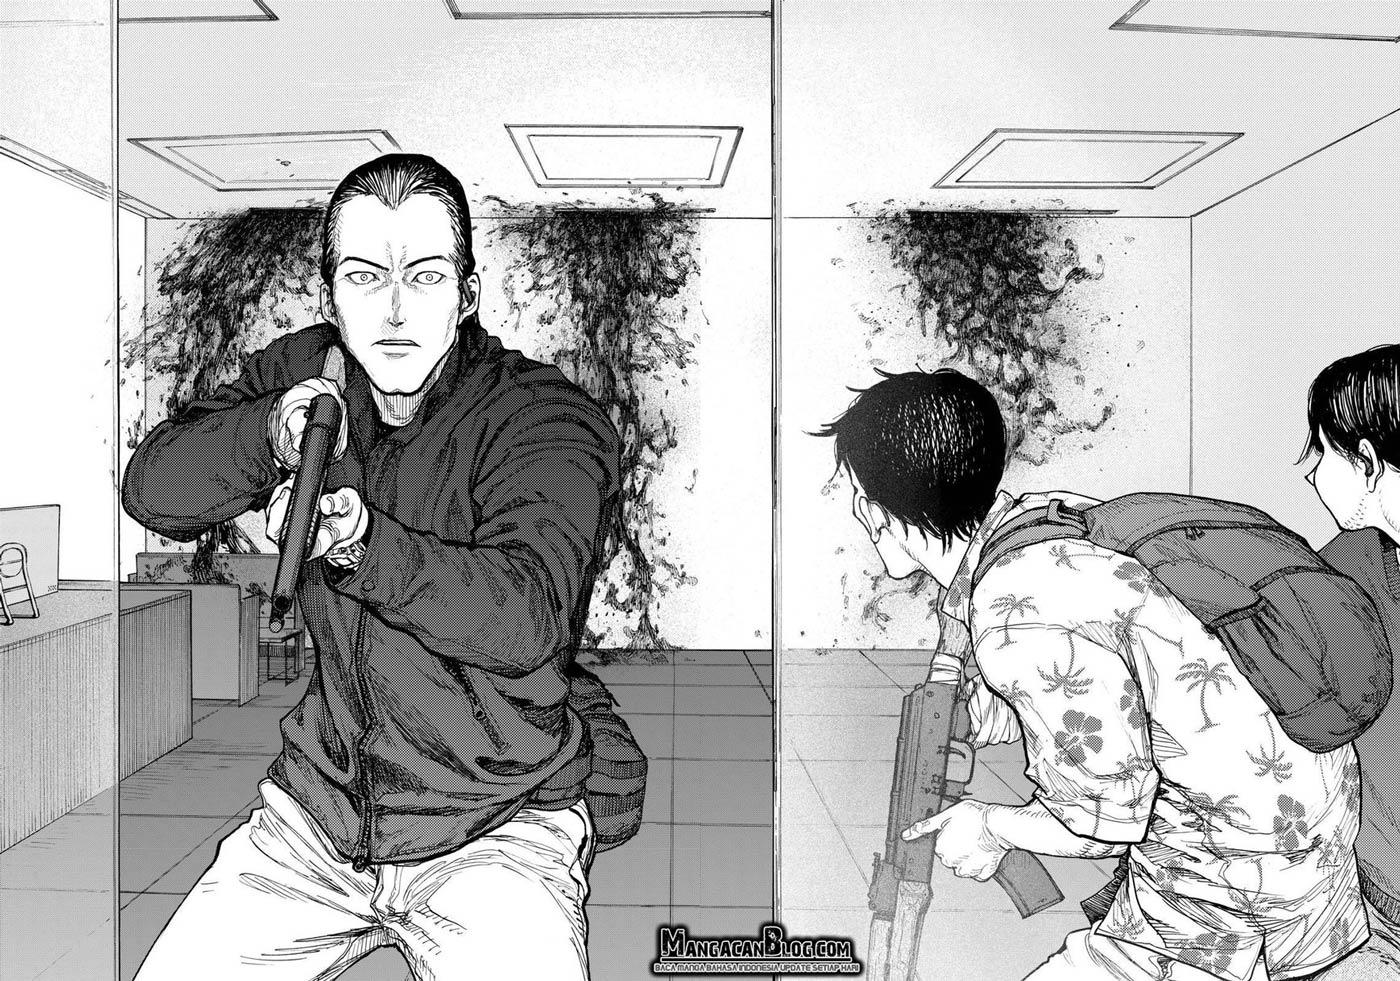 Dilarang COPAS - situs resmi www.mangacanblog.com - Komik ajin 034 - Splinter Cell 35 Indonesia ajin 034 - Splinter Cell Terbaru 27|Baca Manga Komik Indonesia|Mangacan